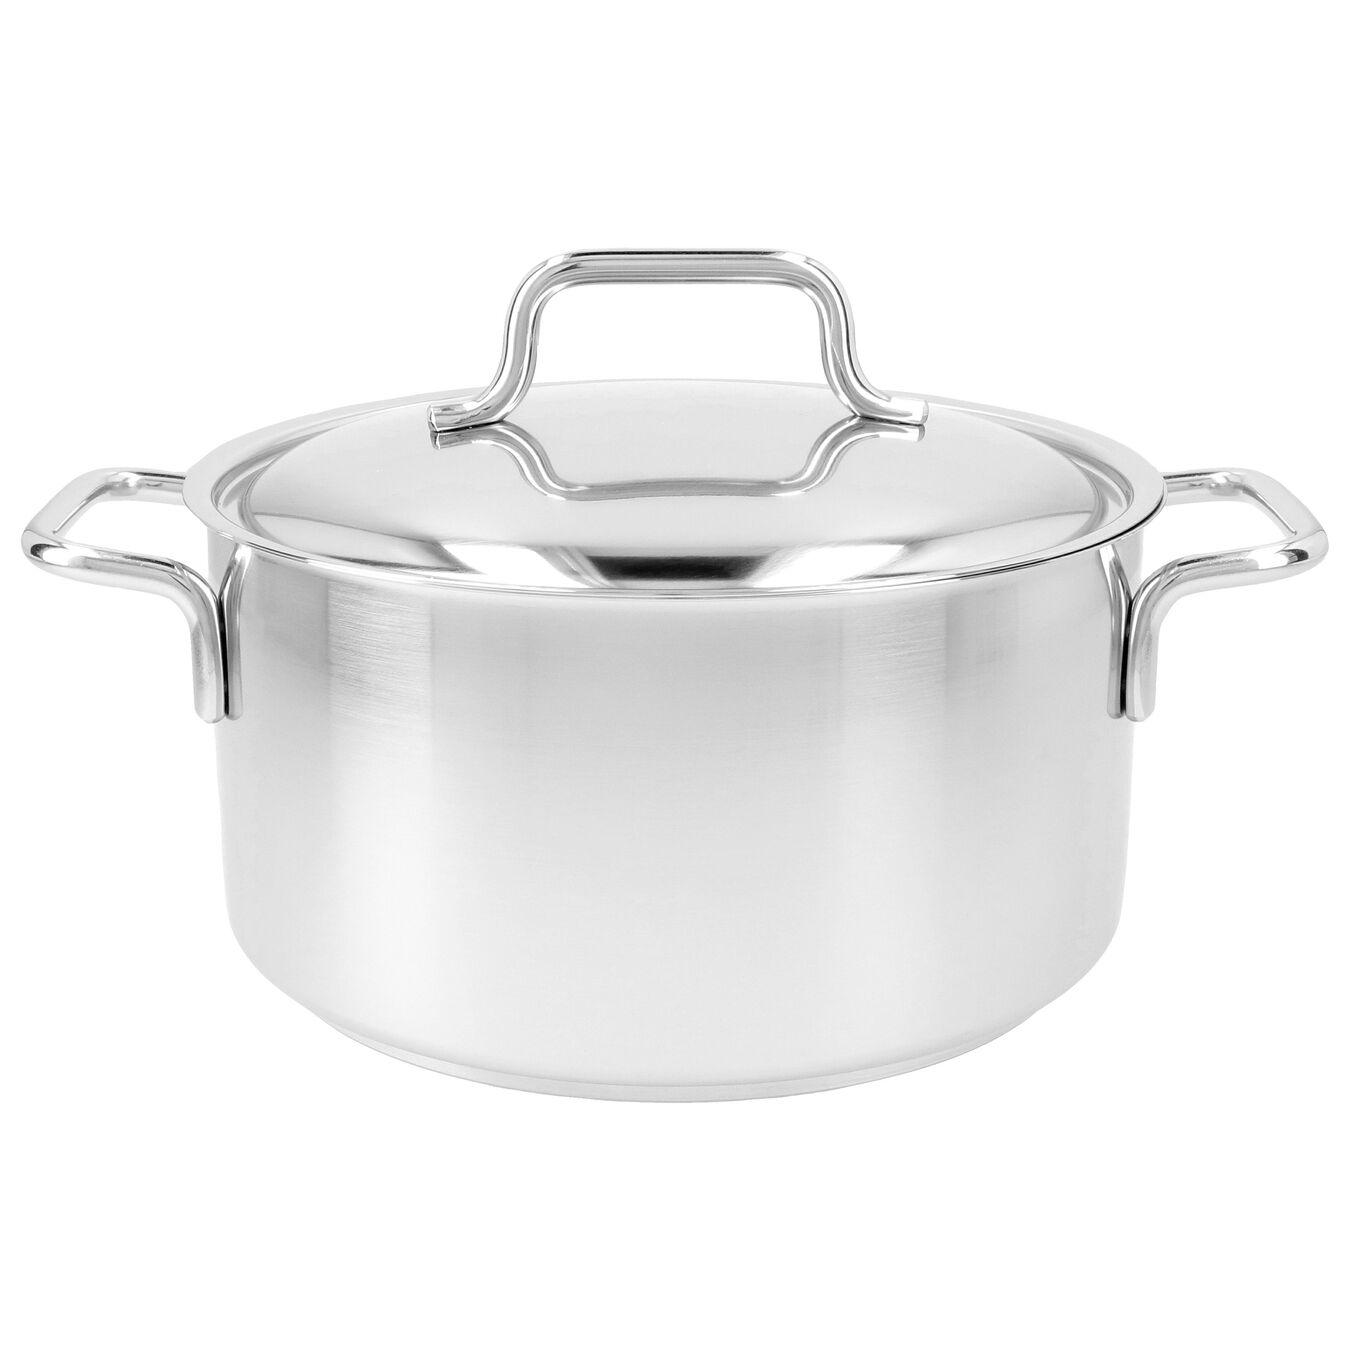 Kookpot met deksel 20 cm / 3 l,,large 1